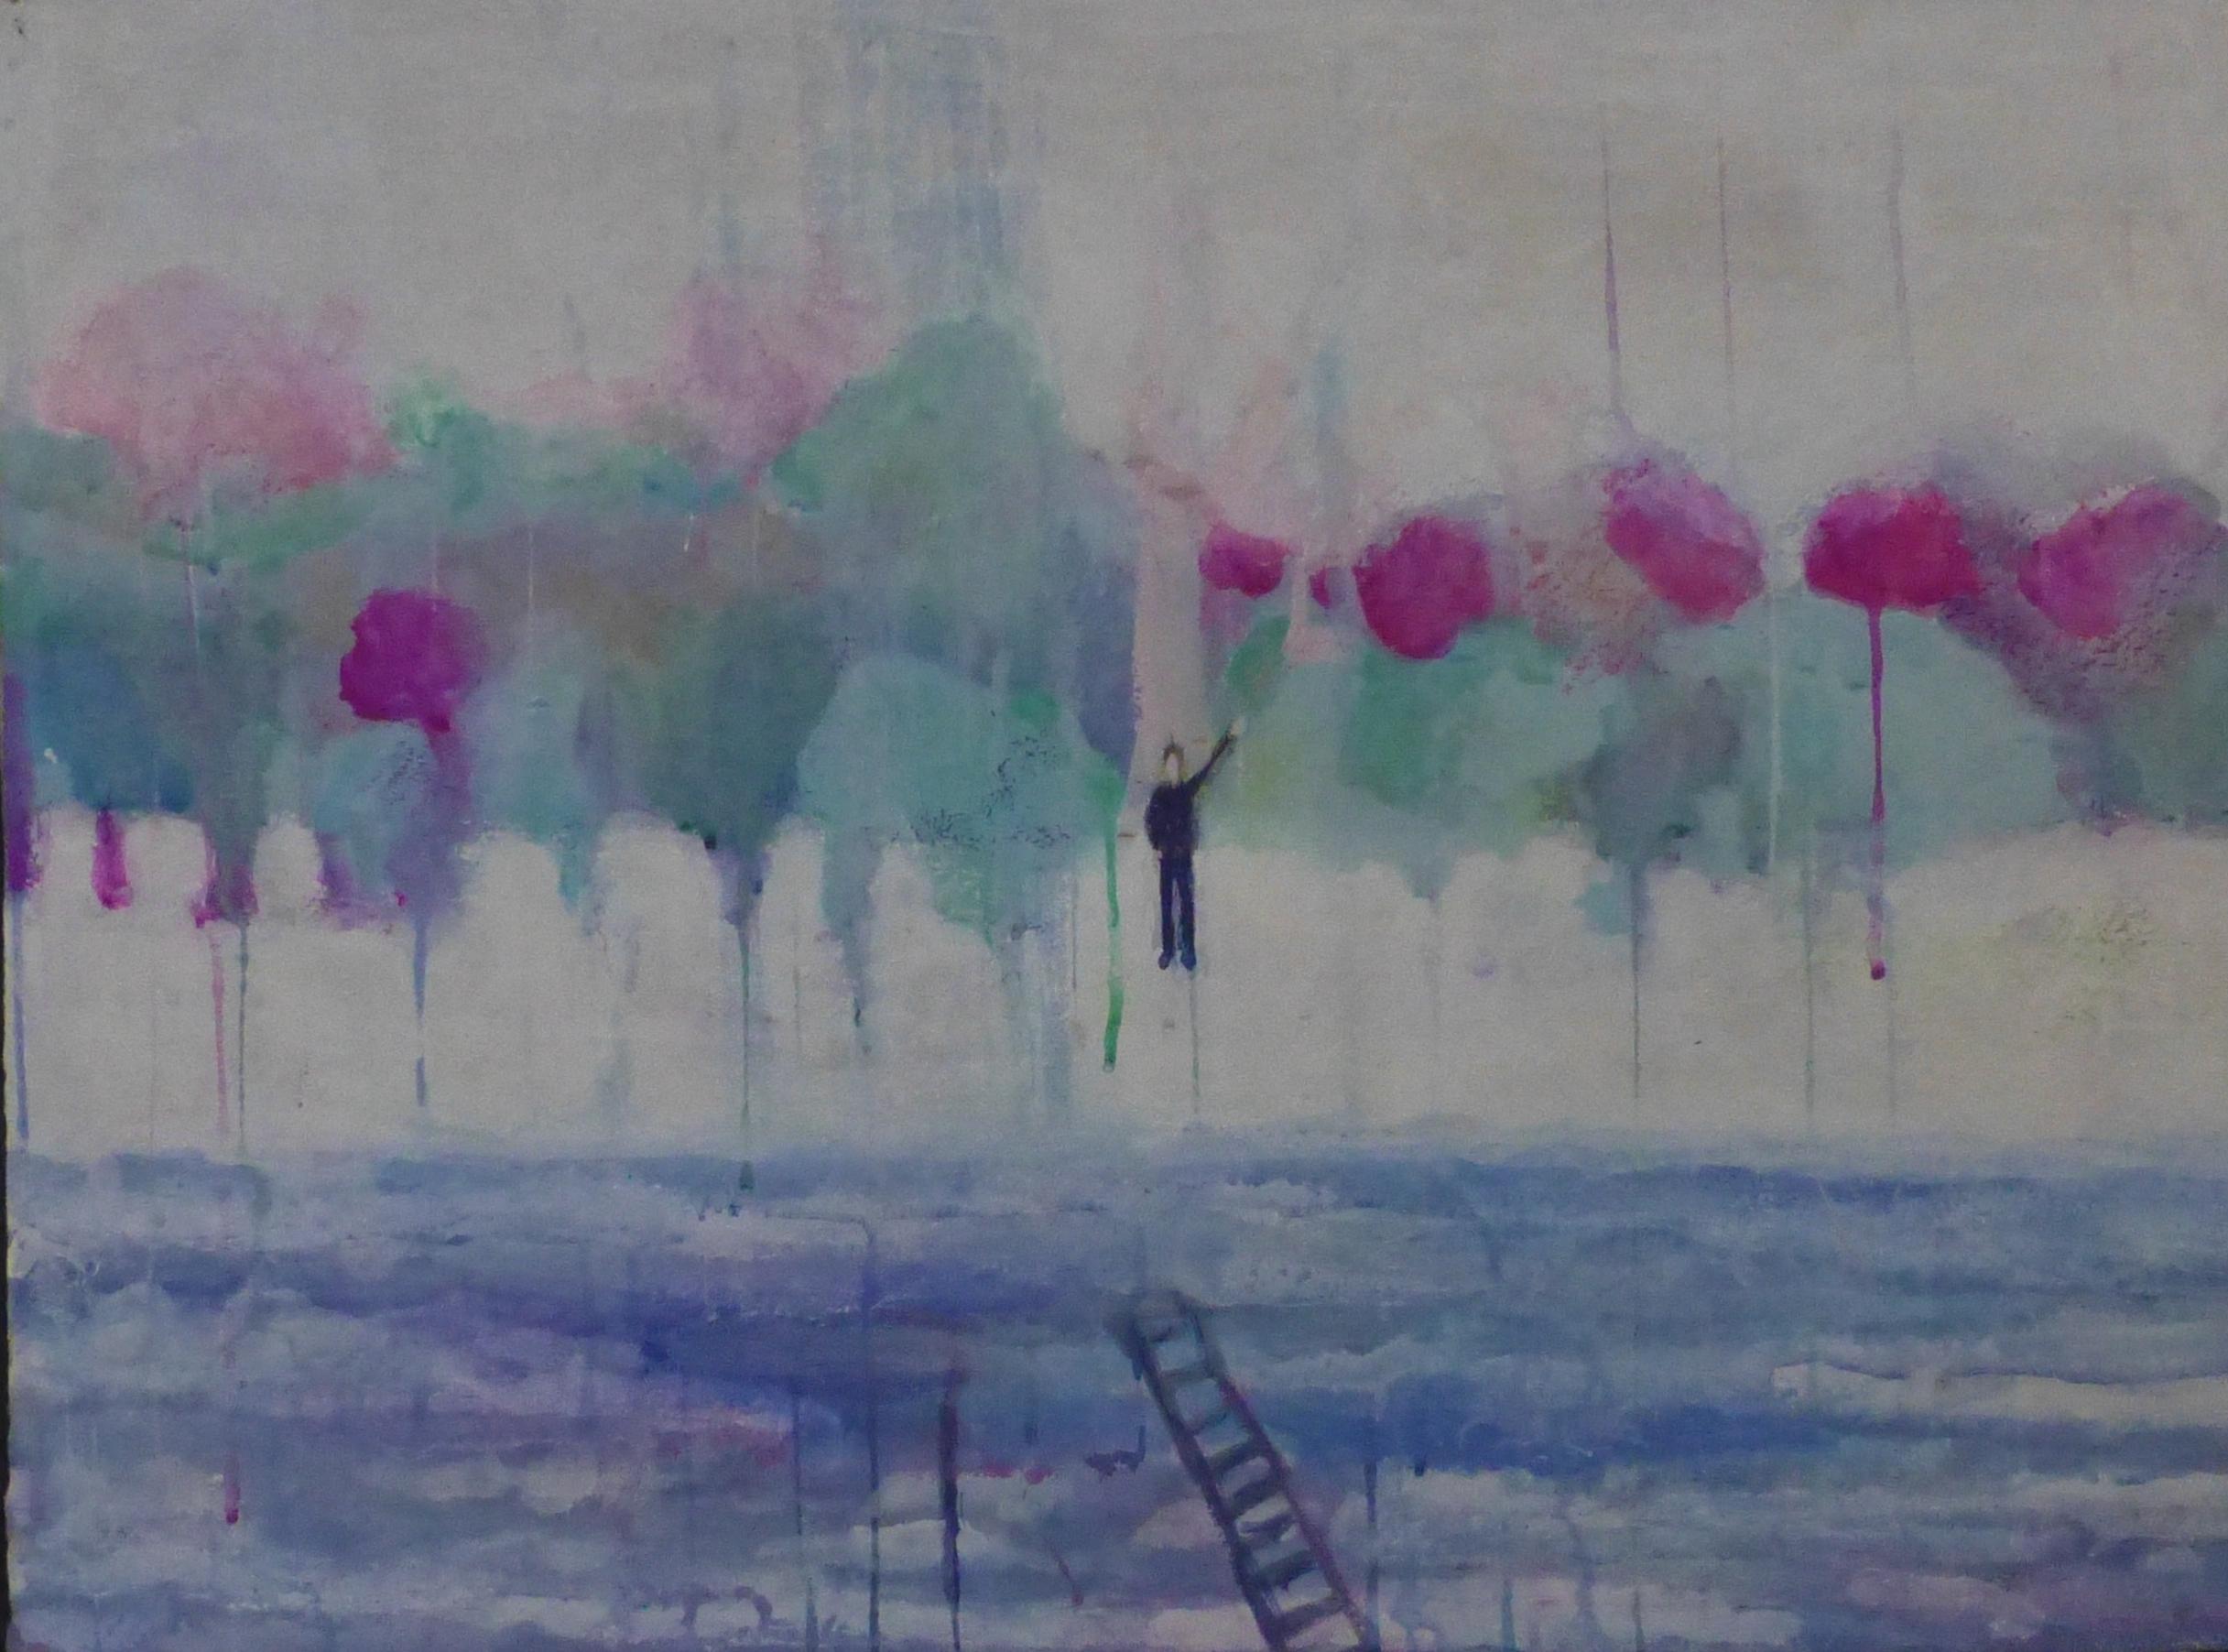 "Horizon 28"" x 22"" Gouache on paper 2015"